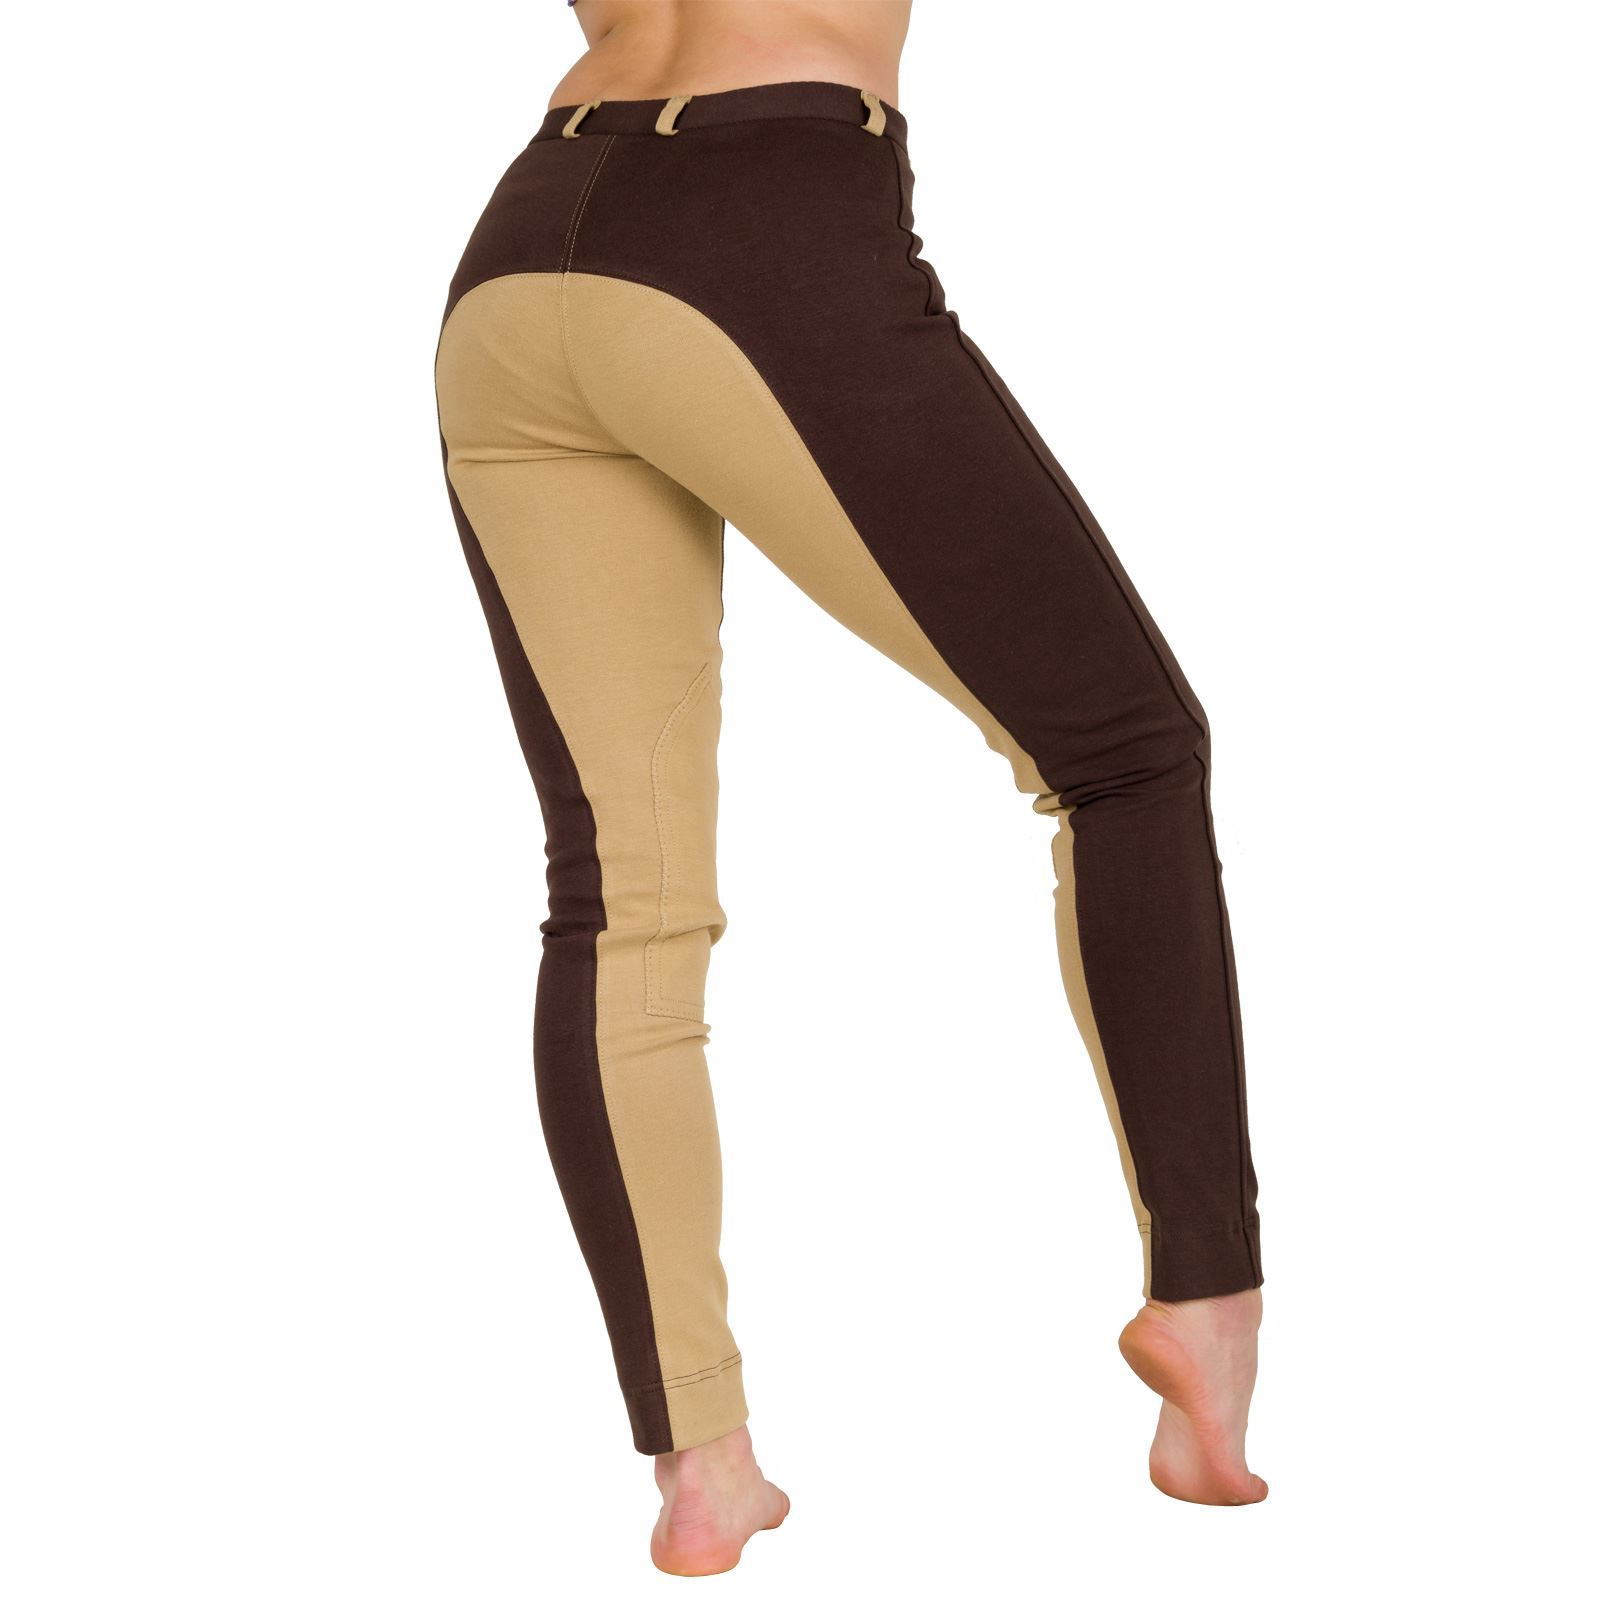 Ladies-Womens-Stretchy-Comfort-2Tone-Plus-Size-Self-Seat-Breeches-Jodhpurs